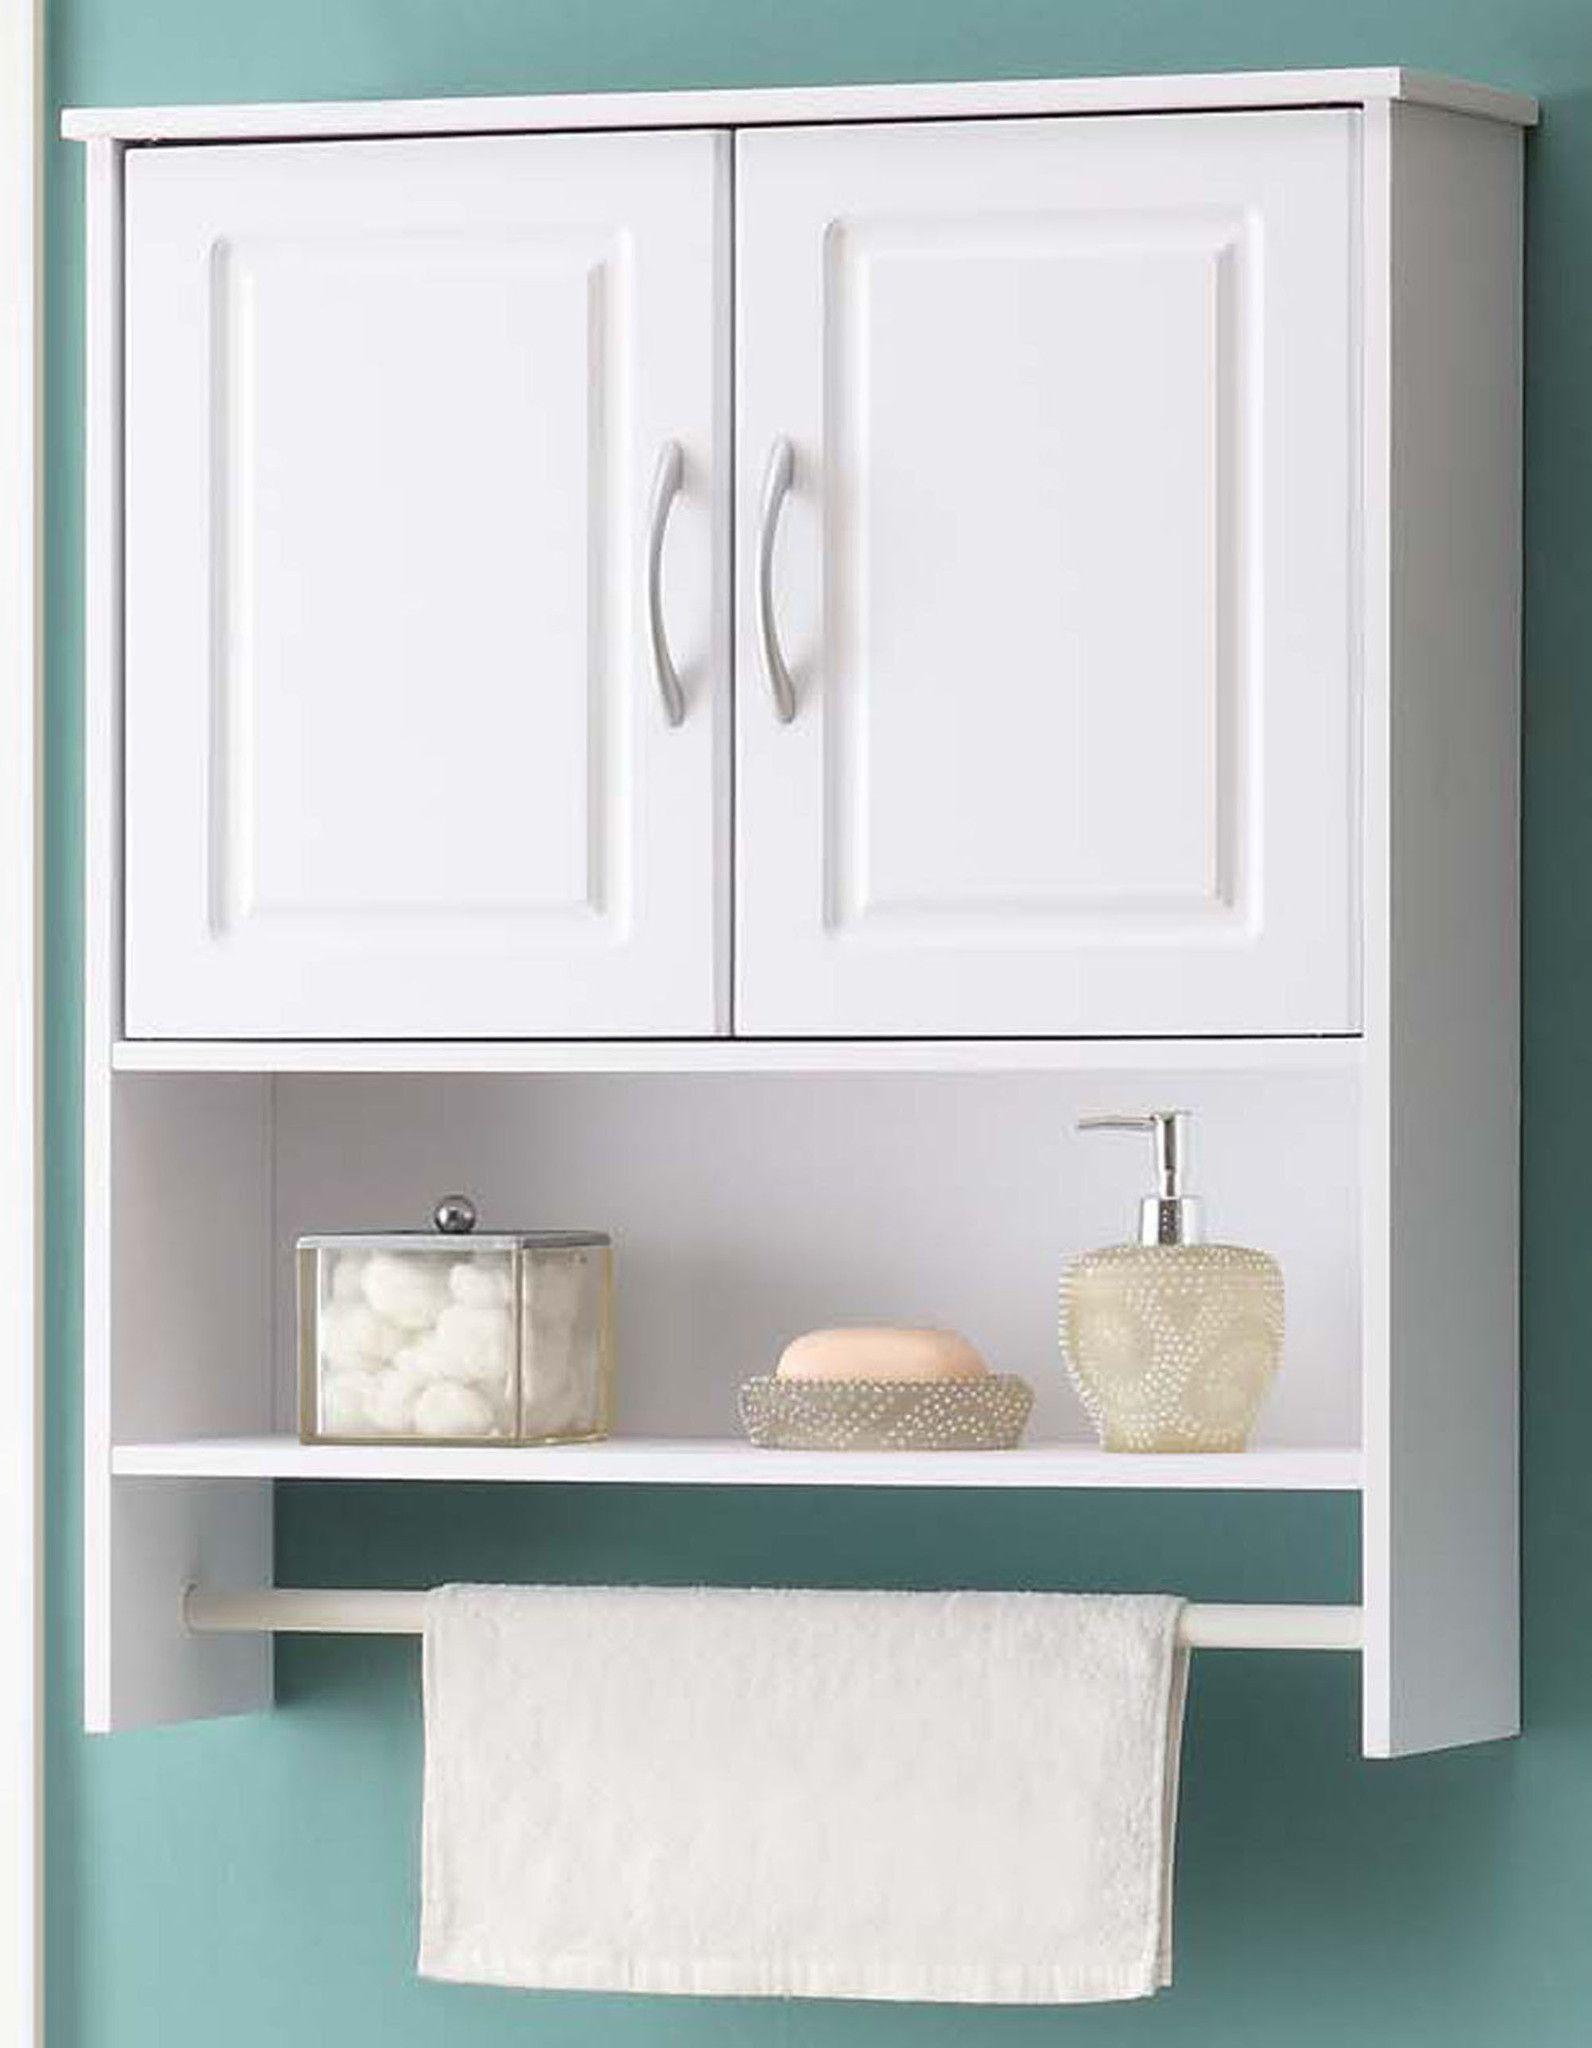 2-Door White Bathroom Wall Storage Cabinet | Bathroom wall storage ...